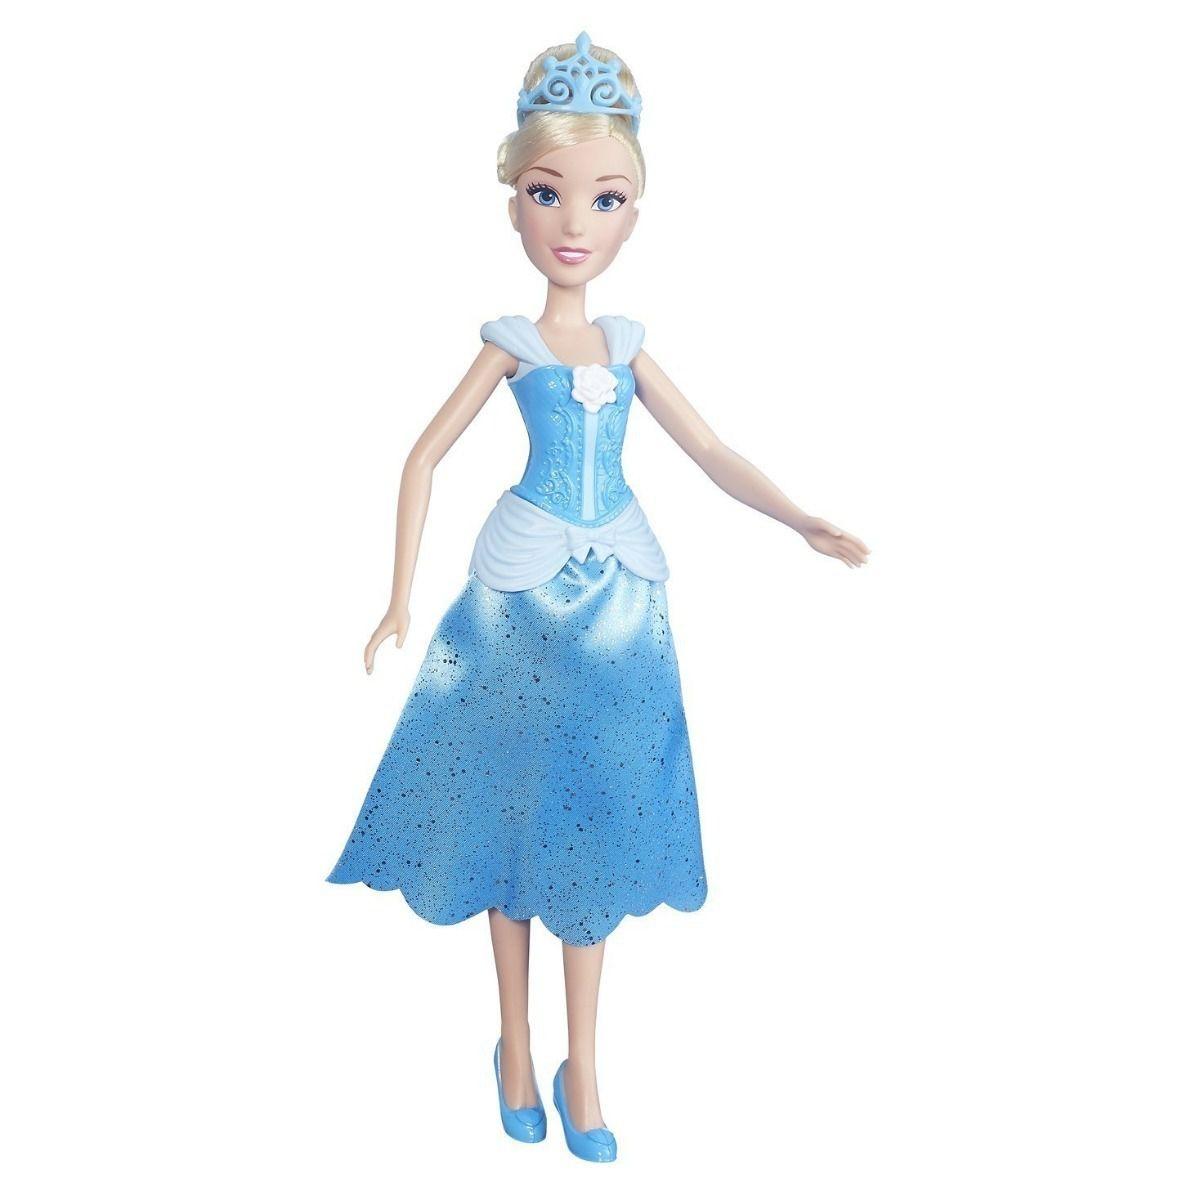 Boneca Disney Princesa Cinderela E2749 - Hasbro